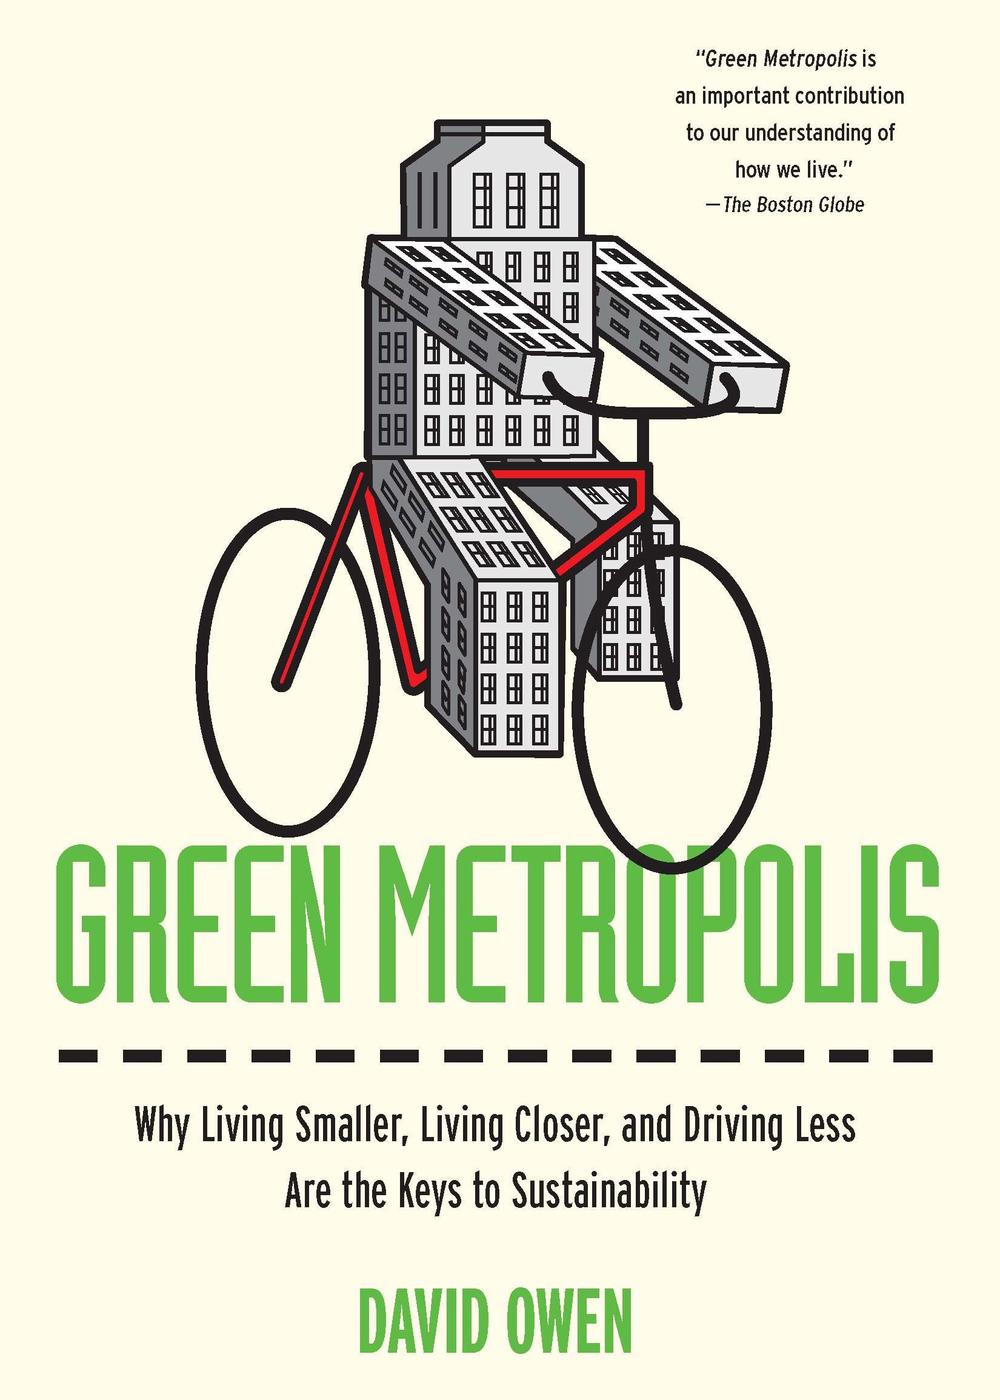 Owen, David - Green Metropolis.jpg